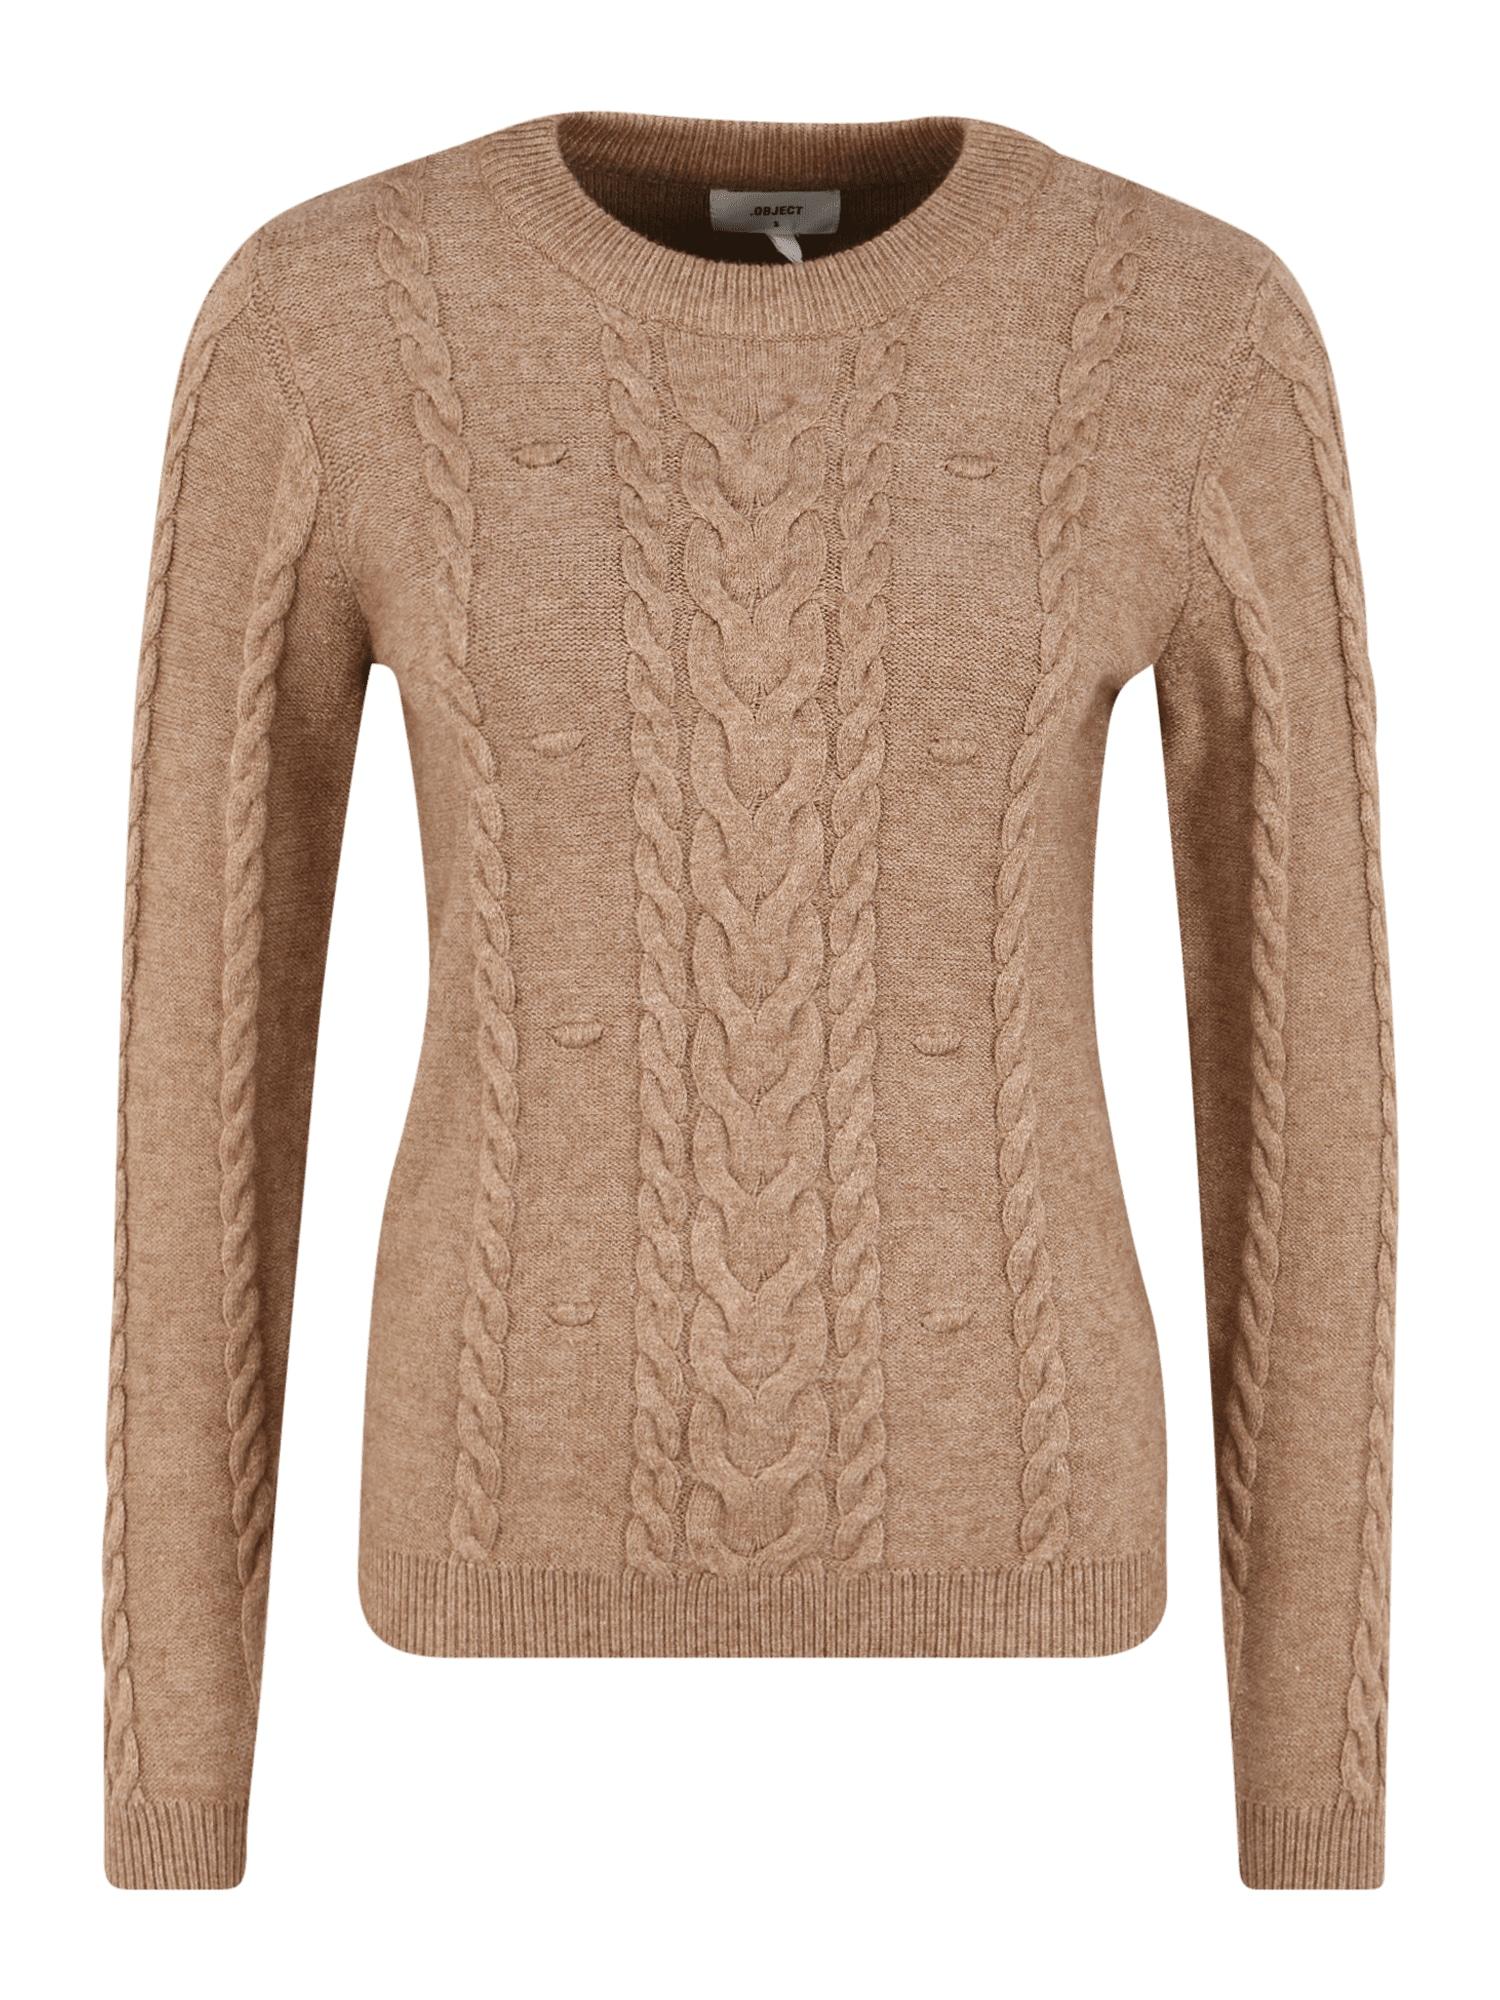 OBJECT (Petite) Megztinis